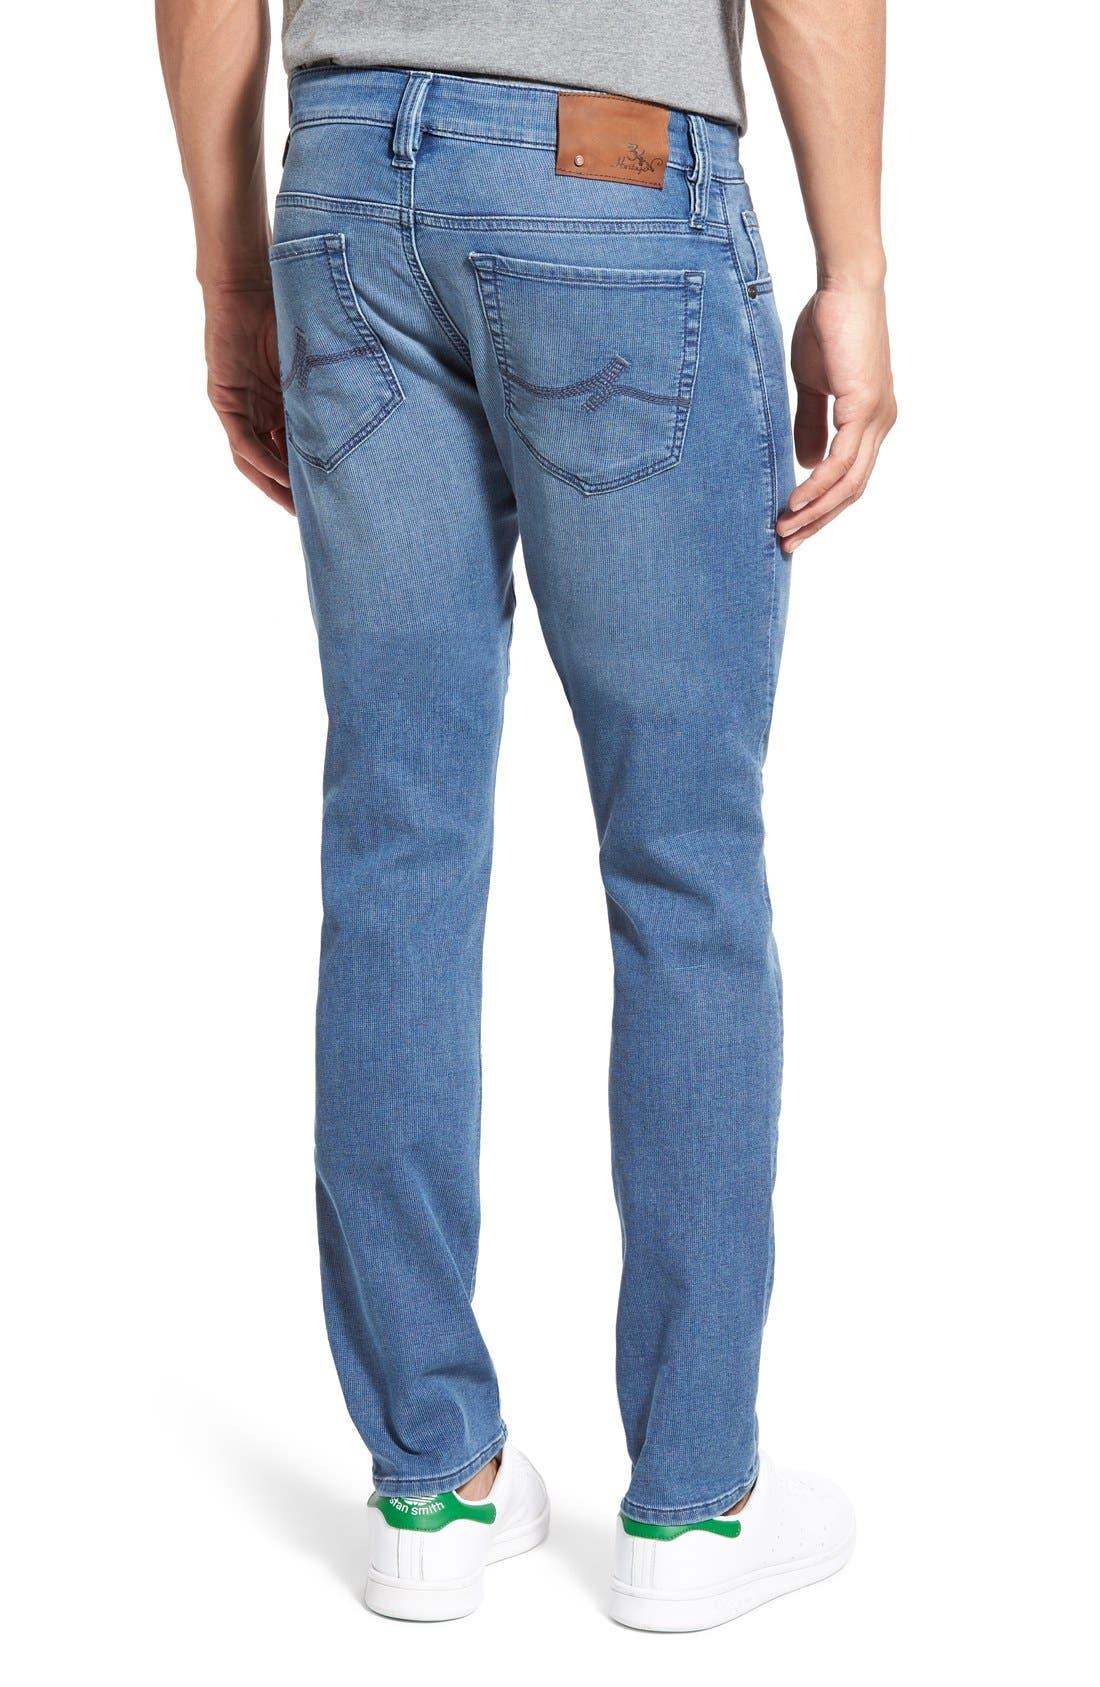 34 HERITAGE,                             'Courage' Straight Leg Jeans,                             Alternate thumbnail 3, color,                             LIGHT INDIGO SPORTY